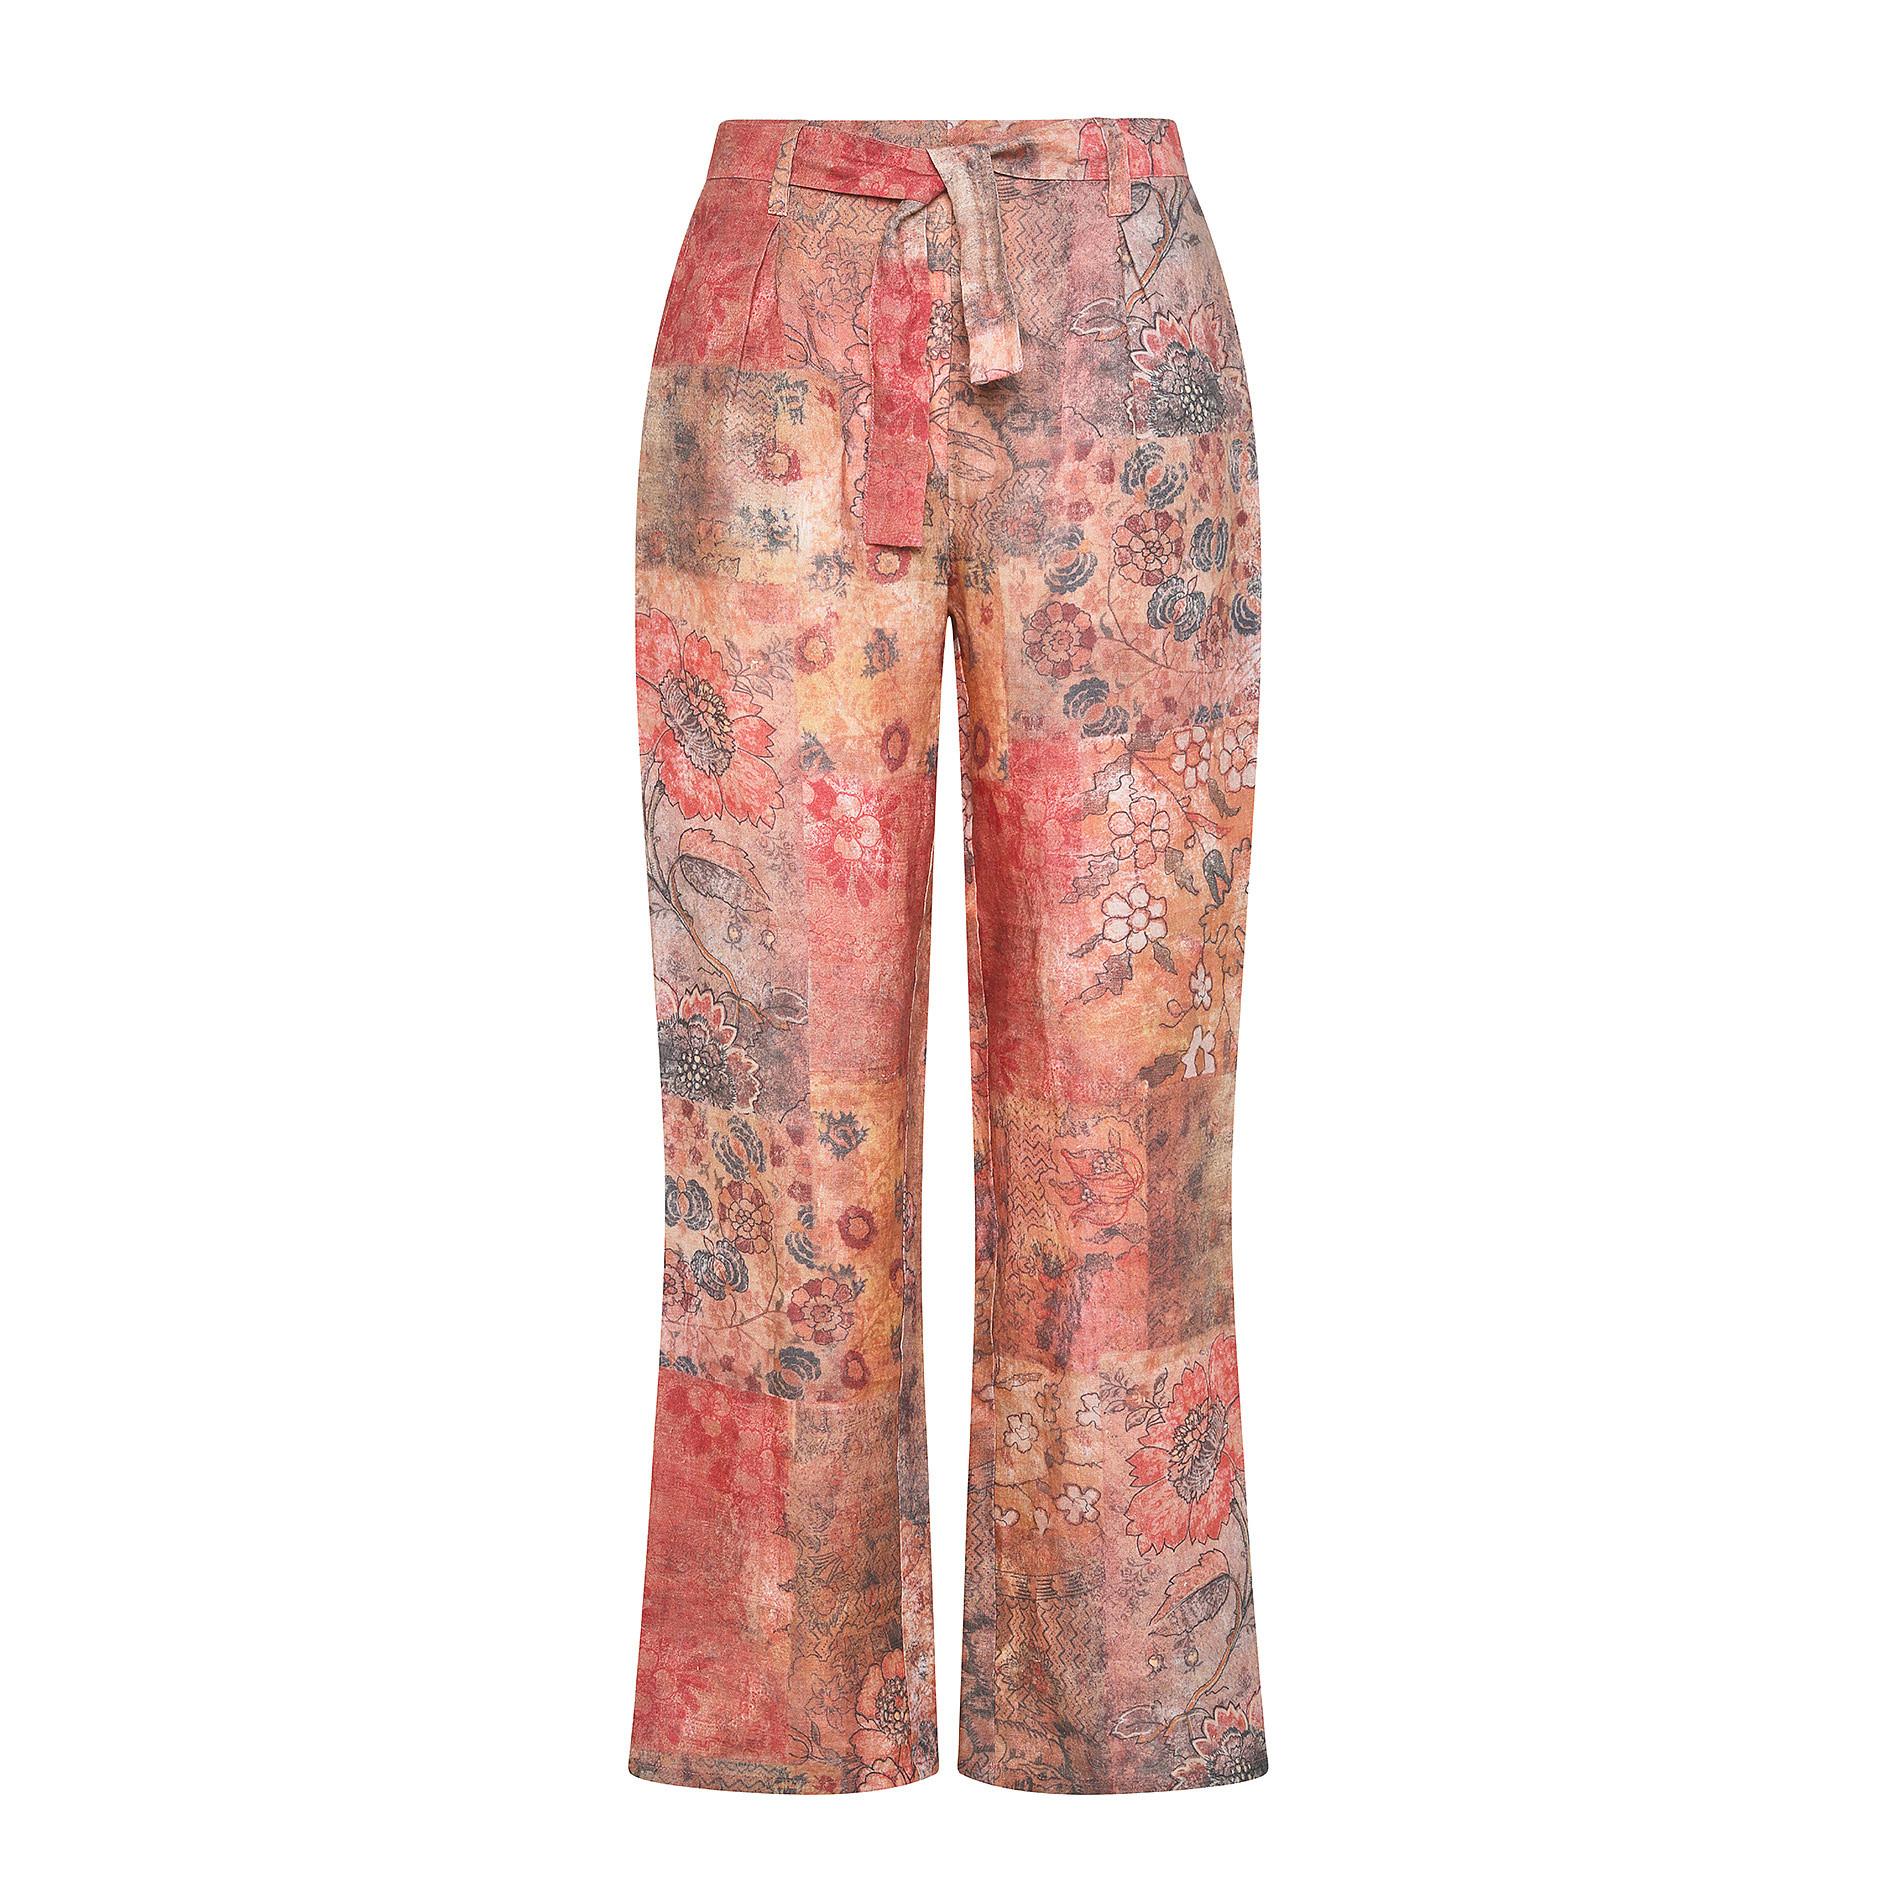 Pantalone morbido in puro lino fantasia floreale, Multicolor, large image number 0